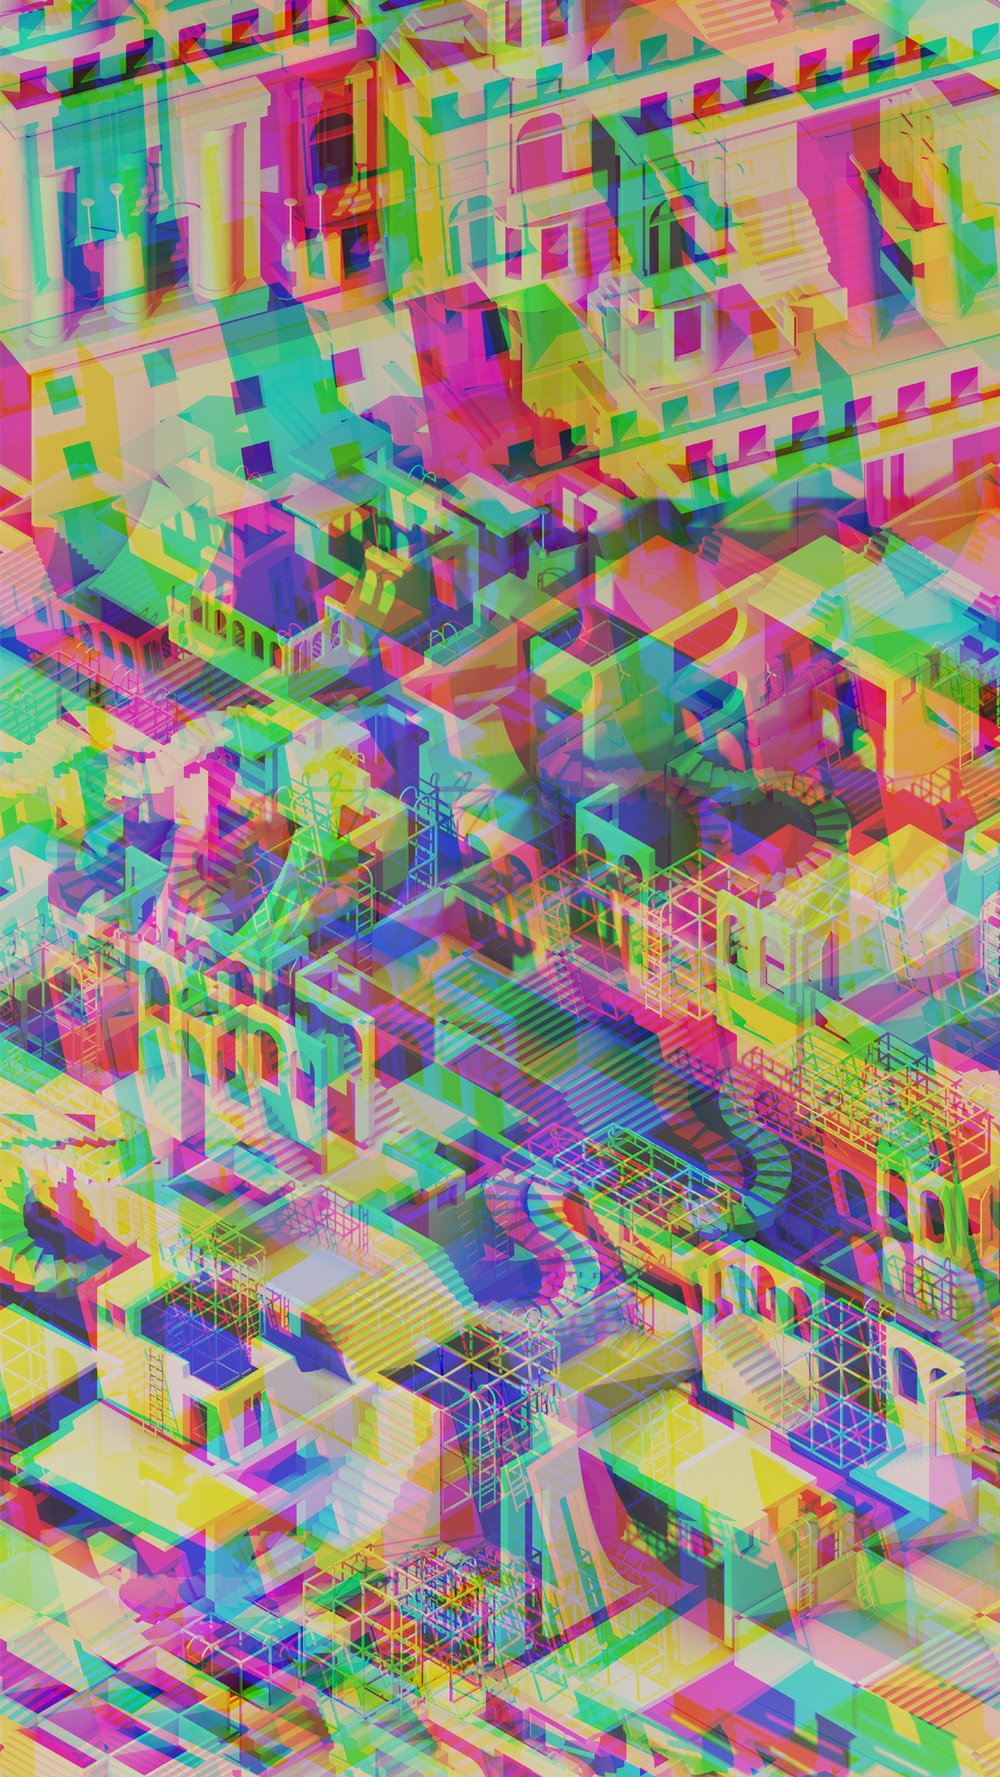 Post-Binary Digital Landscape